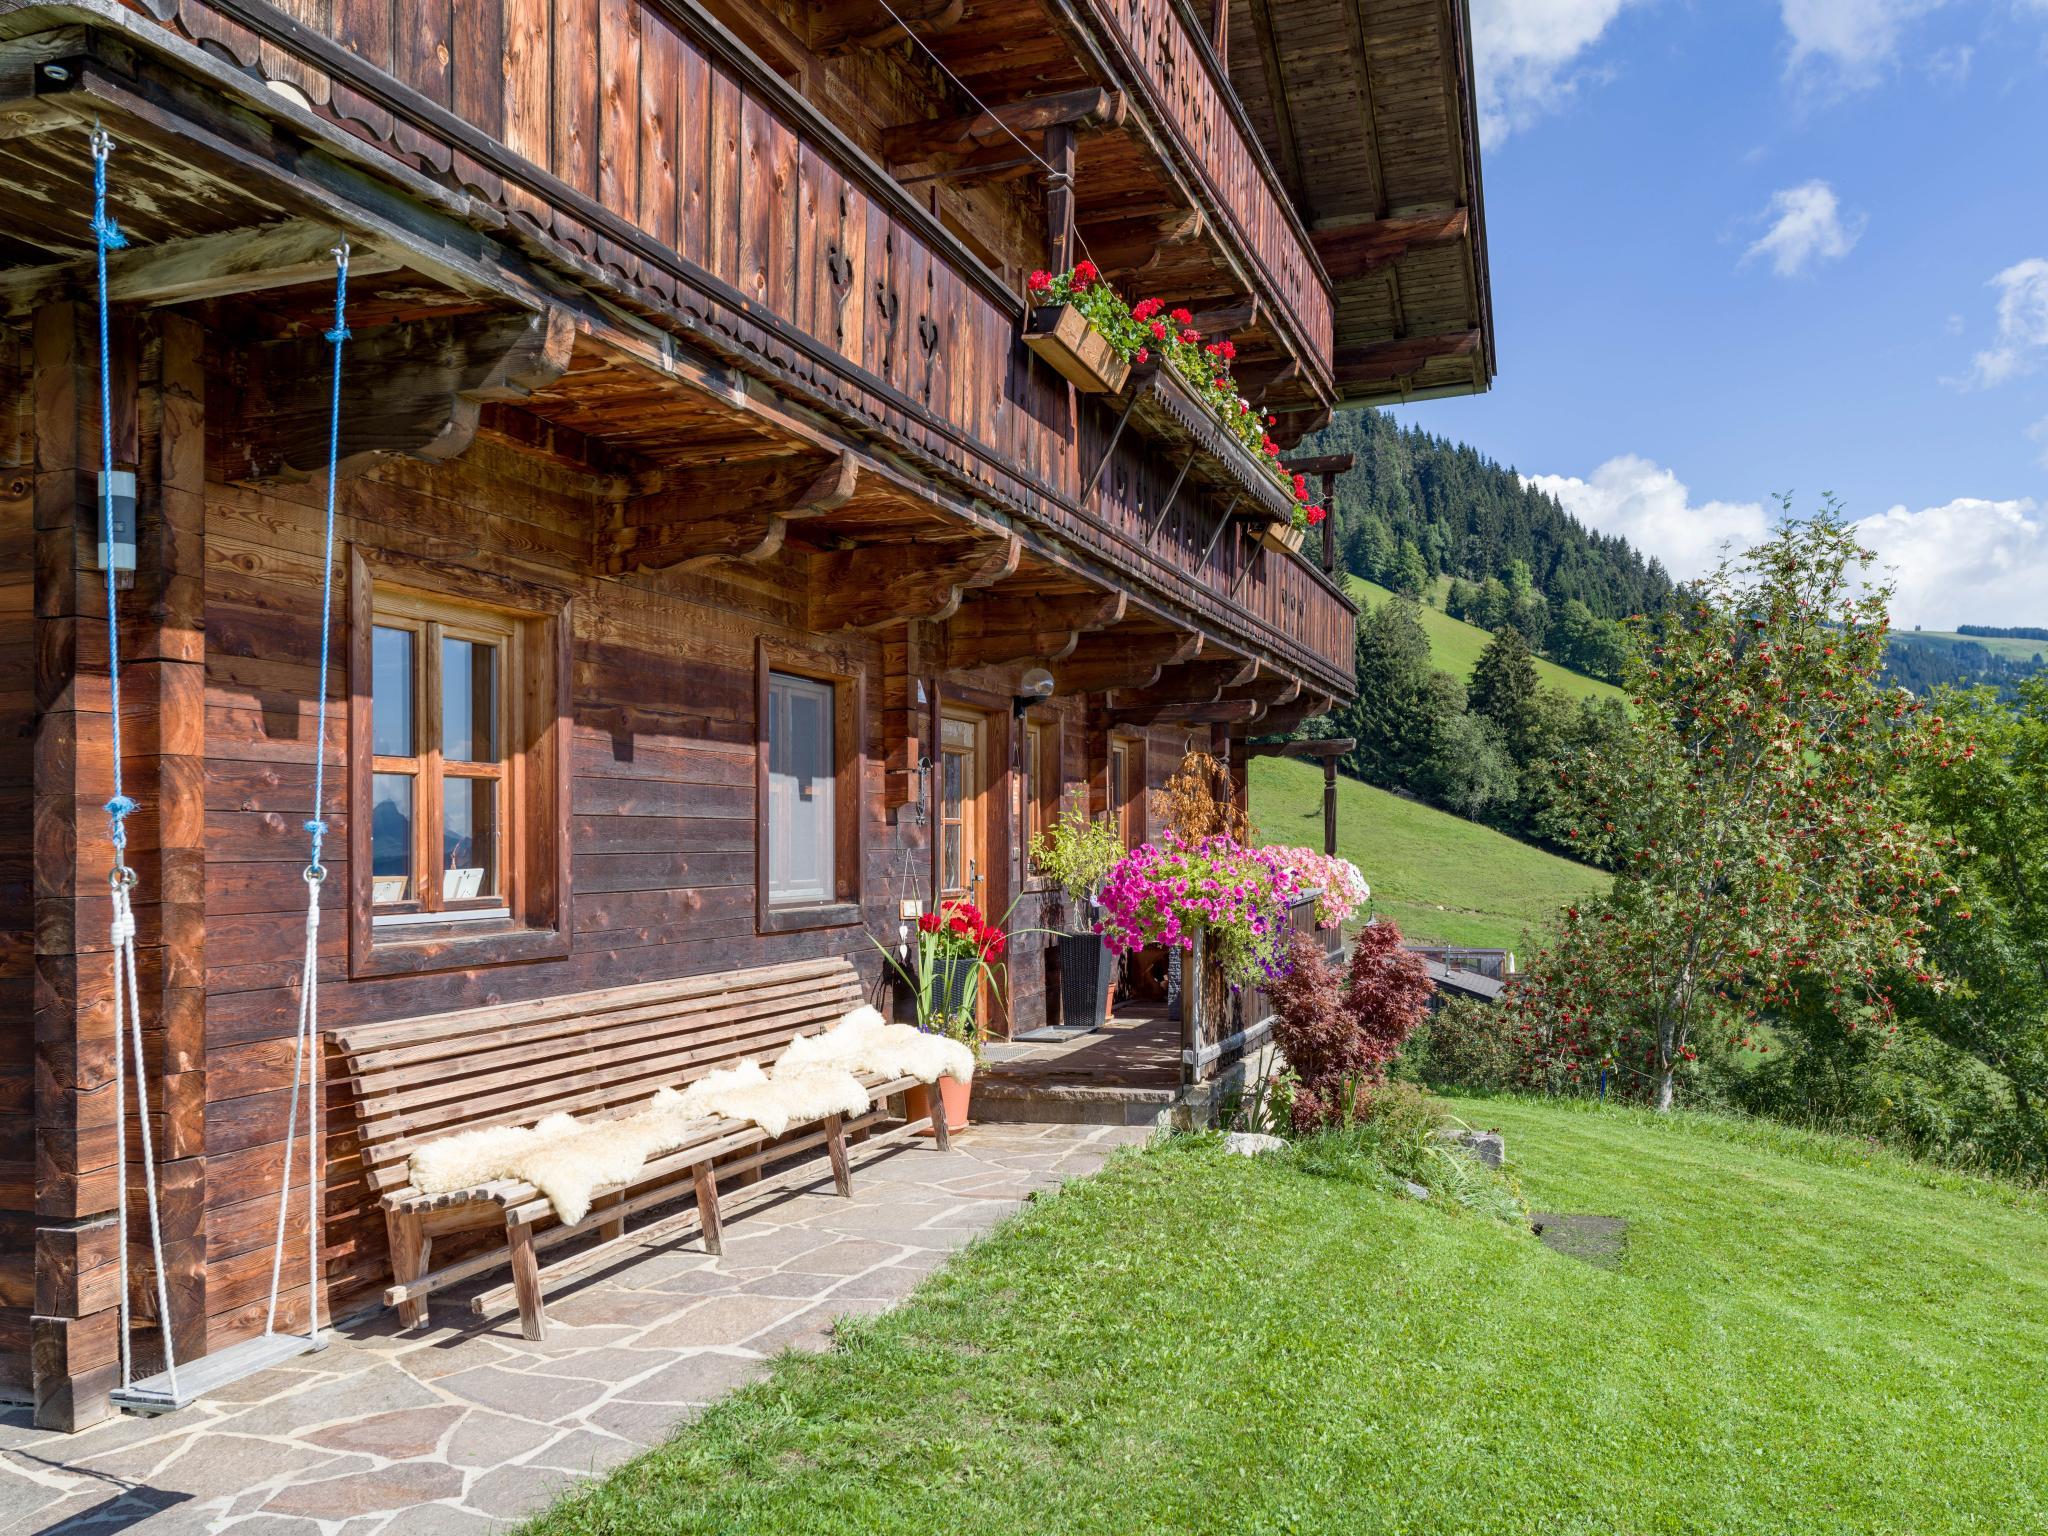 Troadstadl Brixentalblick Tirol